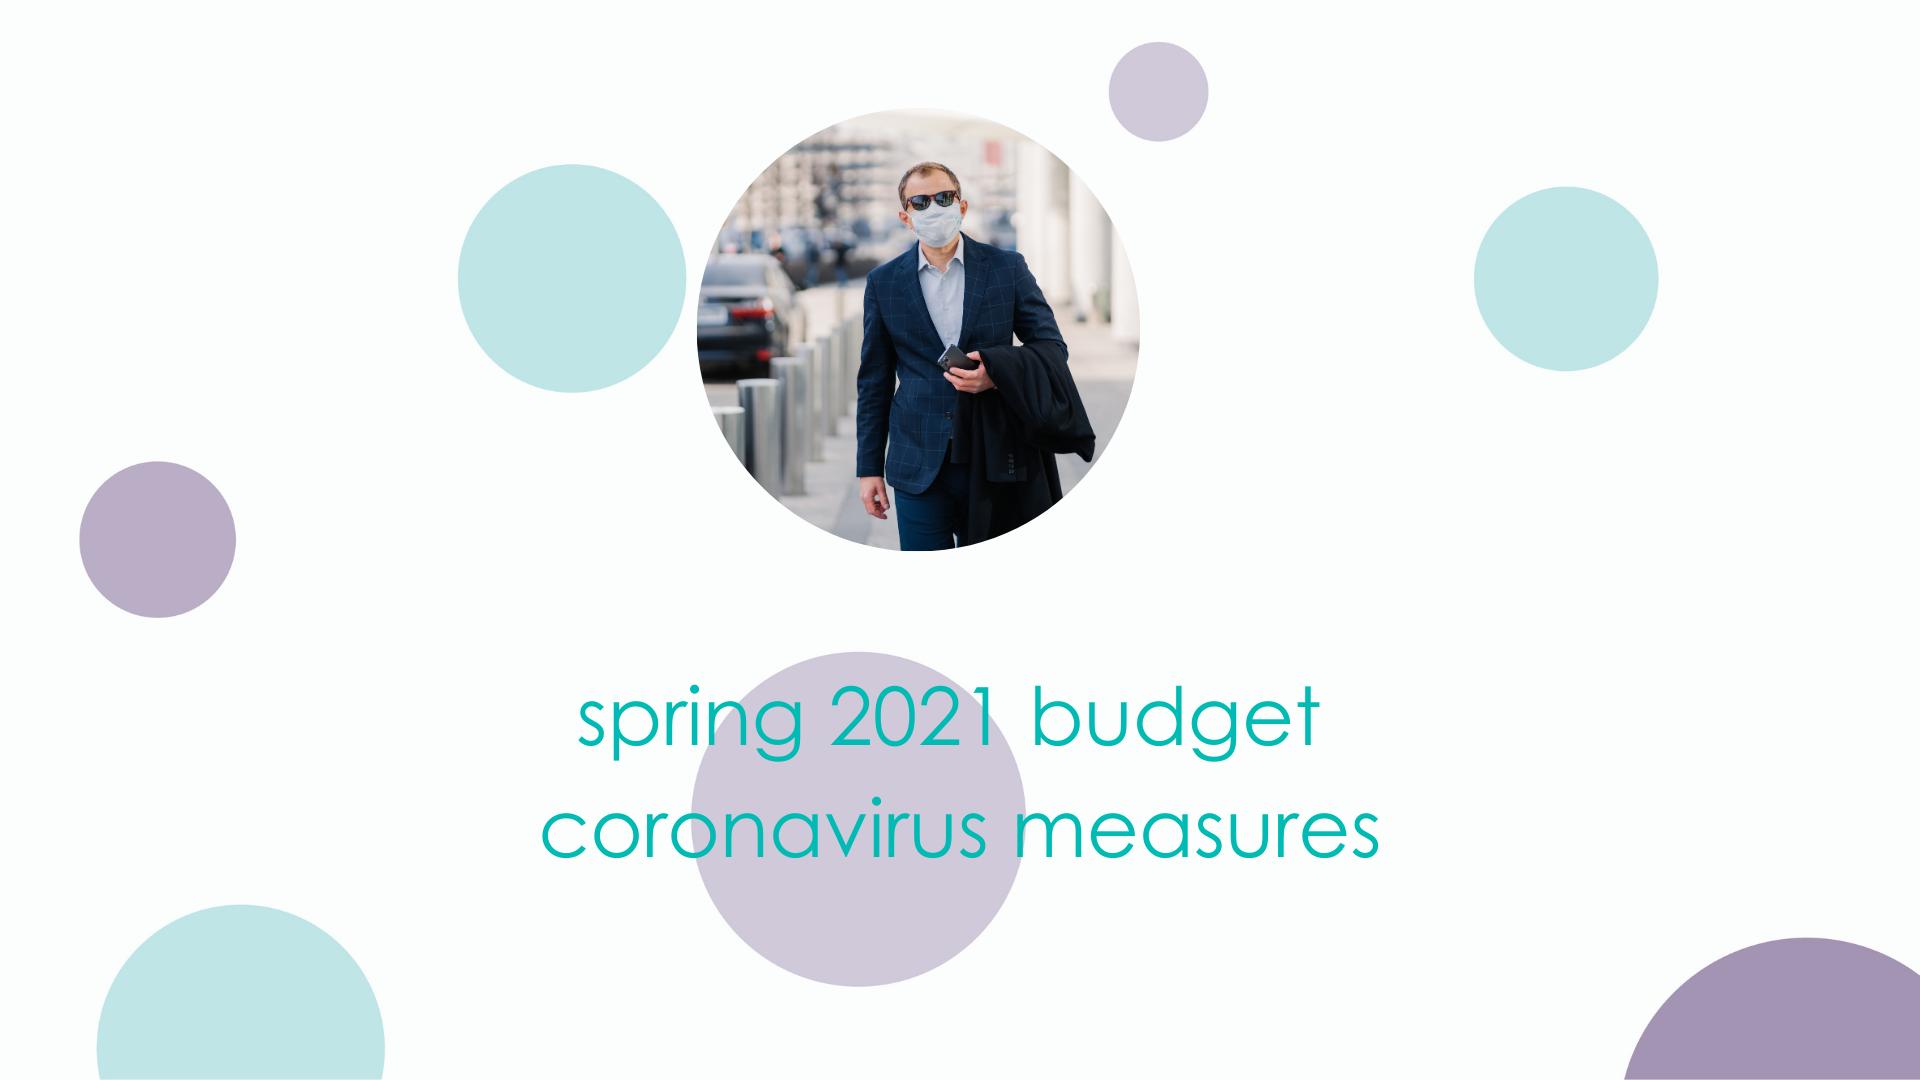 SPRING 2021 BUDGET: CORONAVIRUS MEASURES